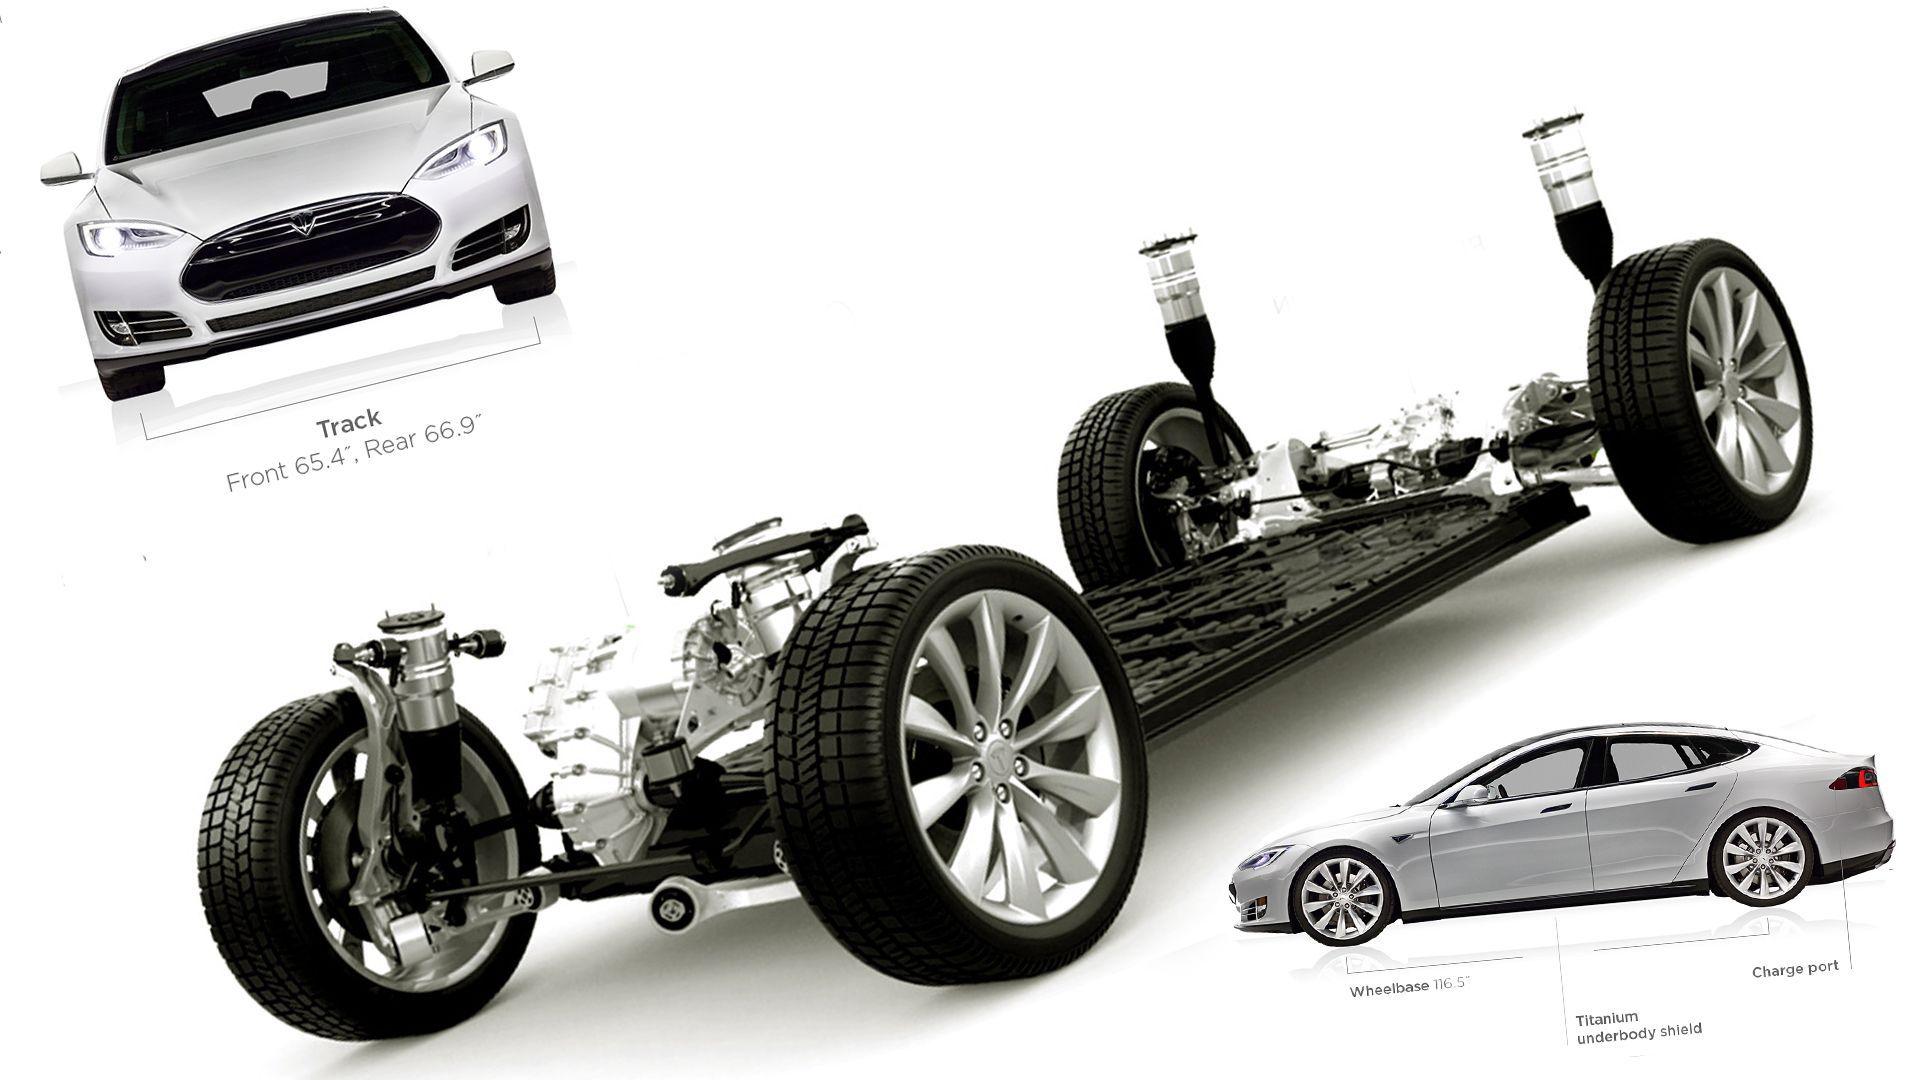 New 2018 Tesla Model X Engine Specs Tesla Model Tesla Model X Tesla Model S